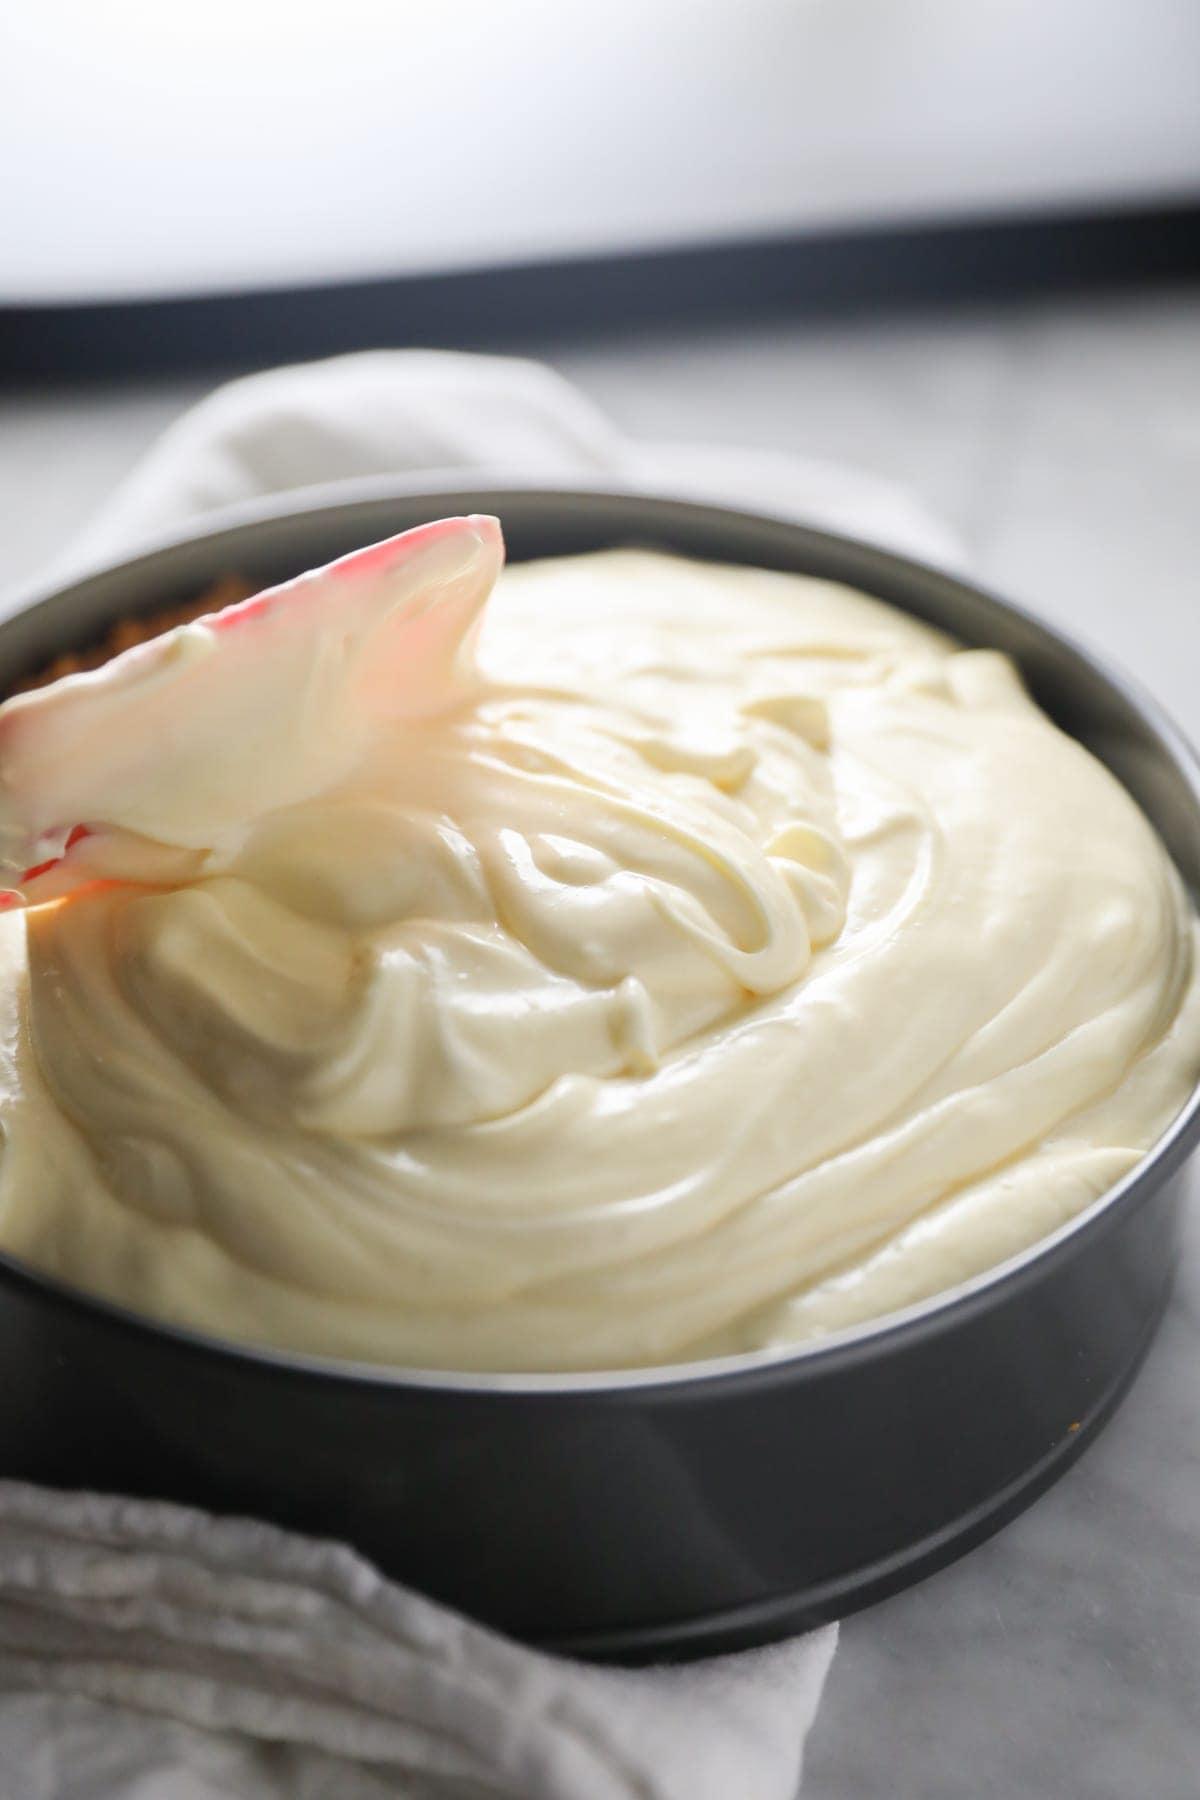 smoothing cheesecake batter into pan